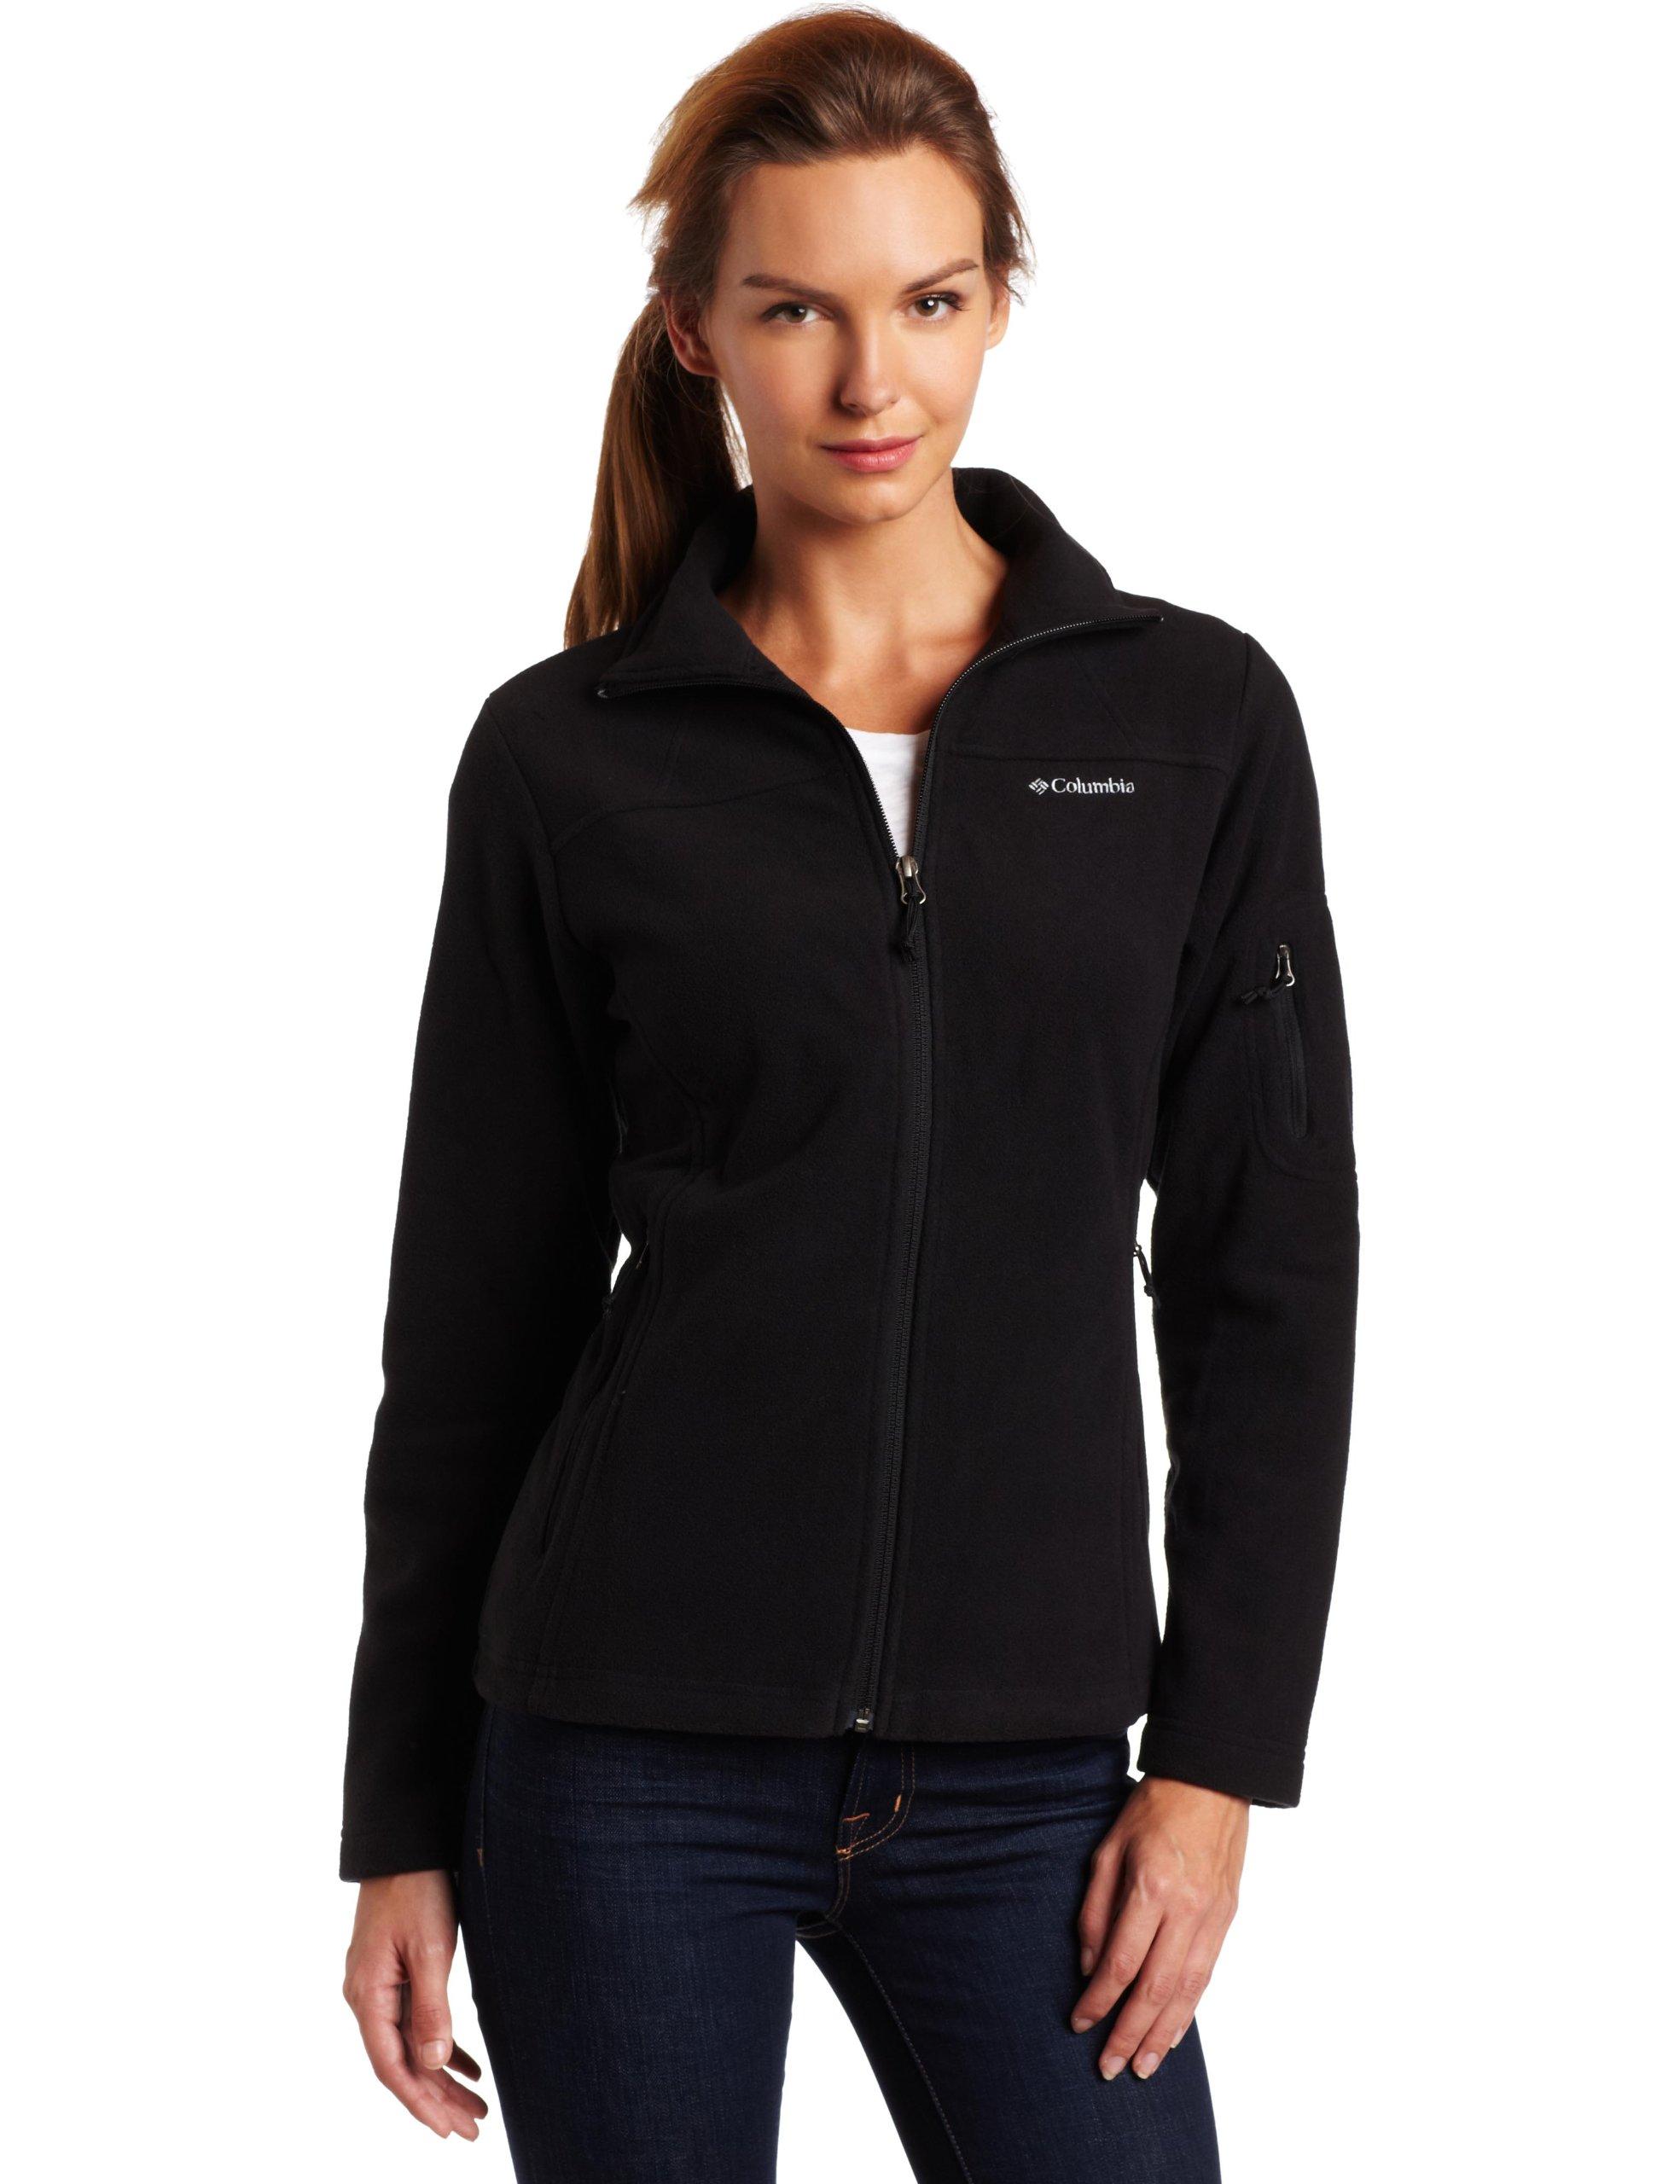 Columbia Women's Fast Trek Ii Full Zip Fleece Jacket Outerwear, black, XS by Columbia (Image #1)